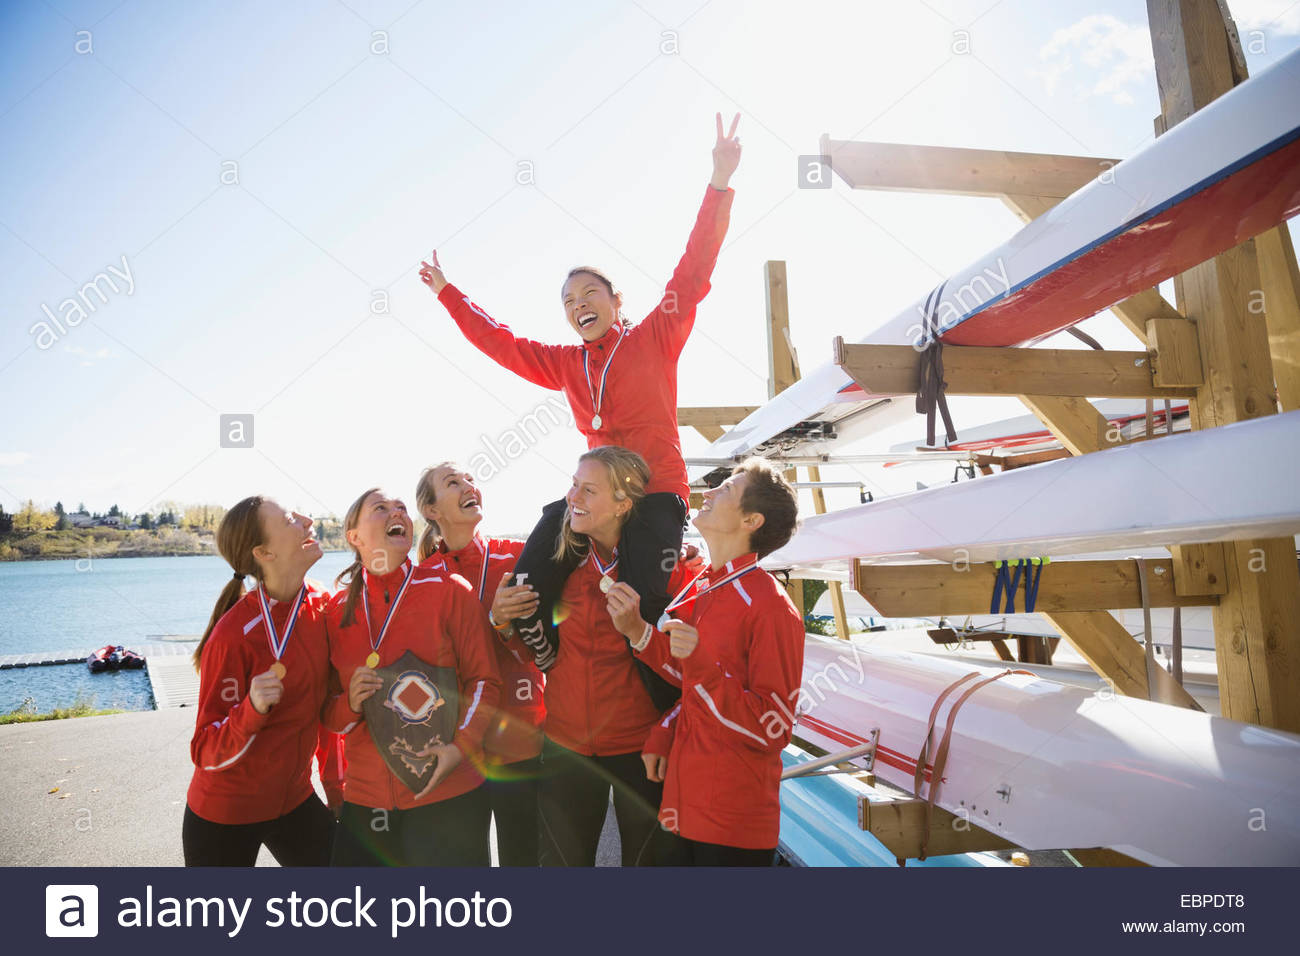 Equipo de remo con medallas celebrando cerca sculls Imagen De Stock